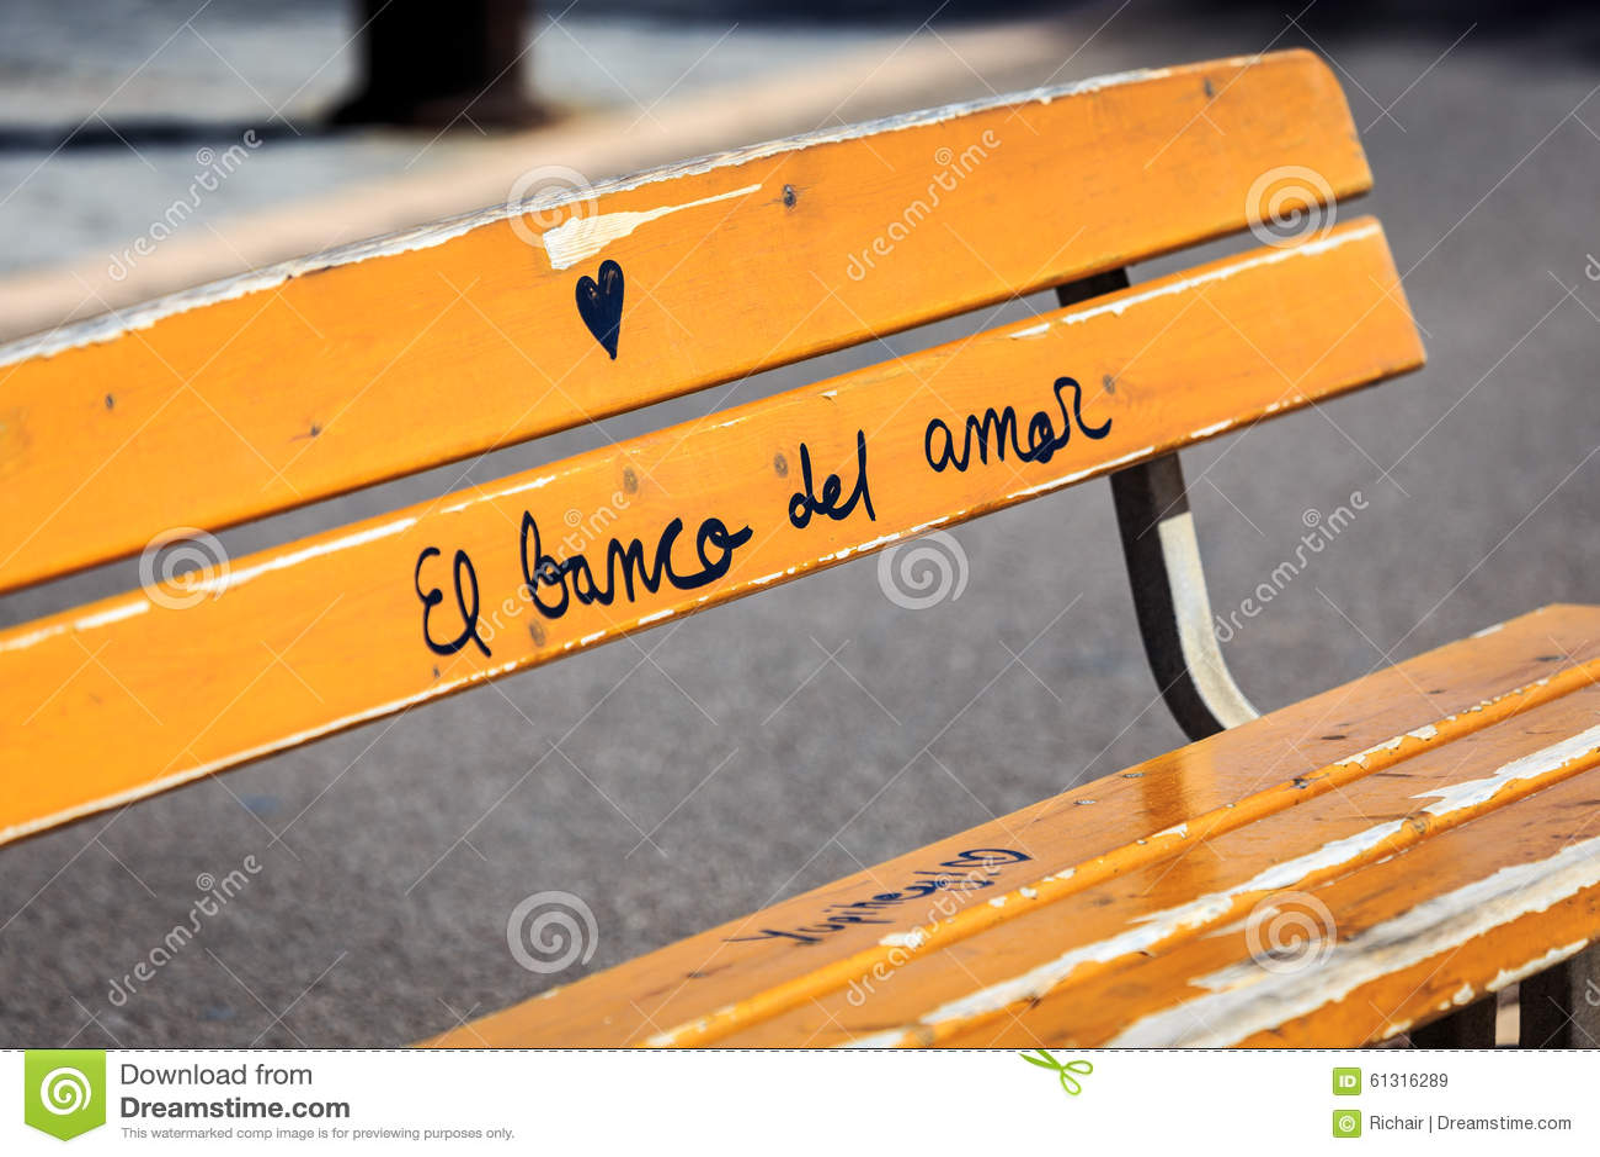 Graffiti on bench